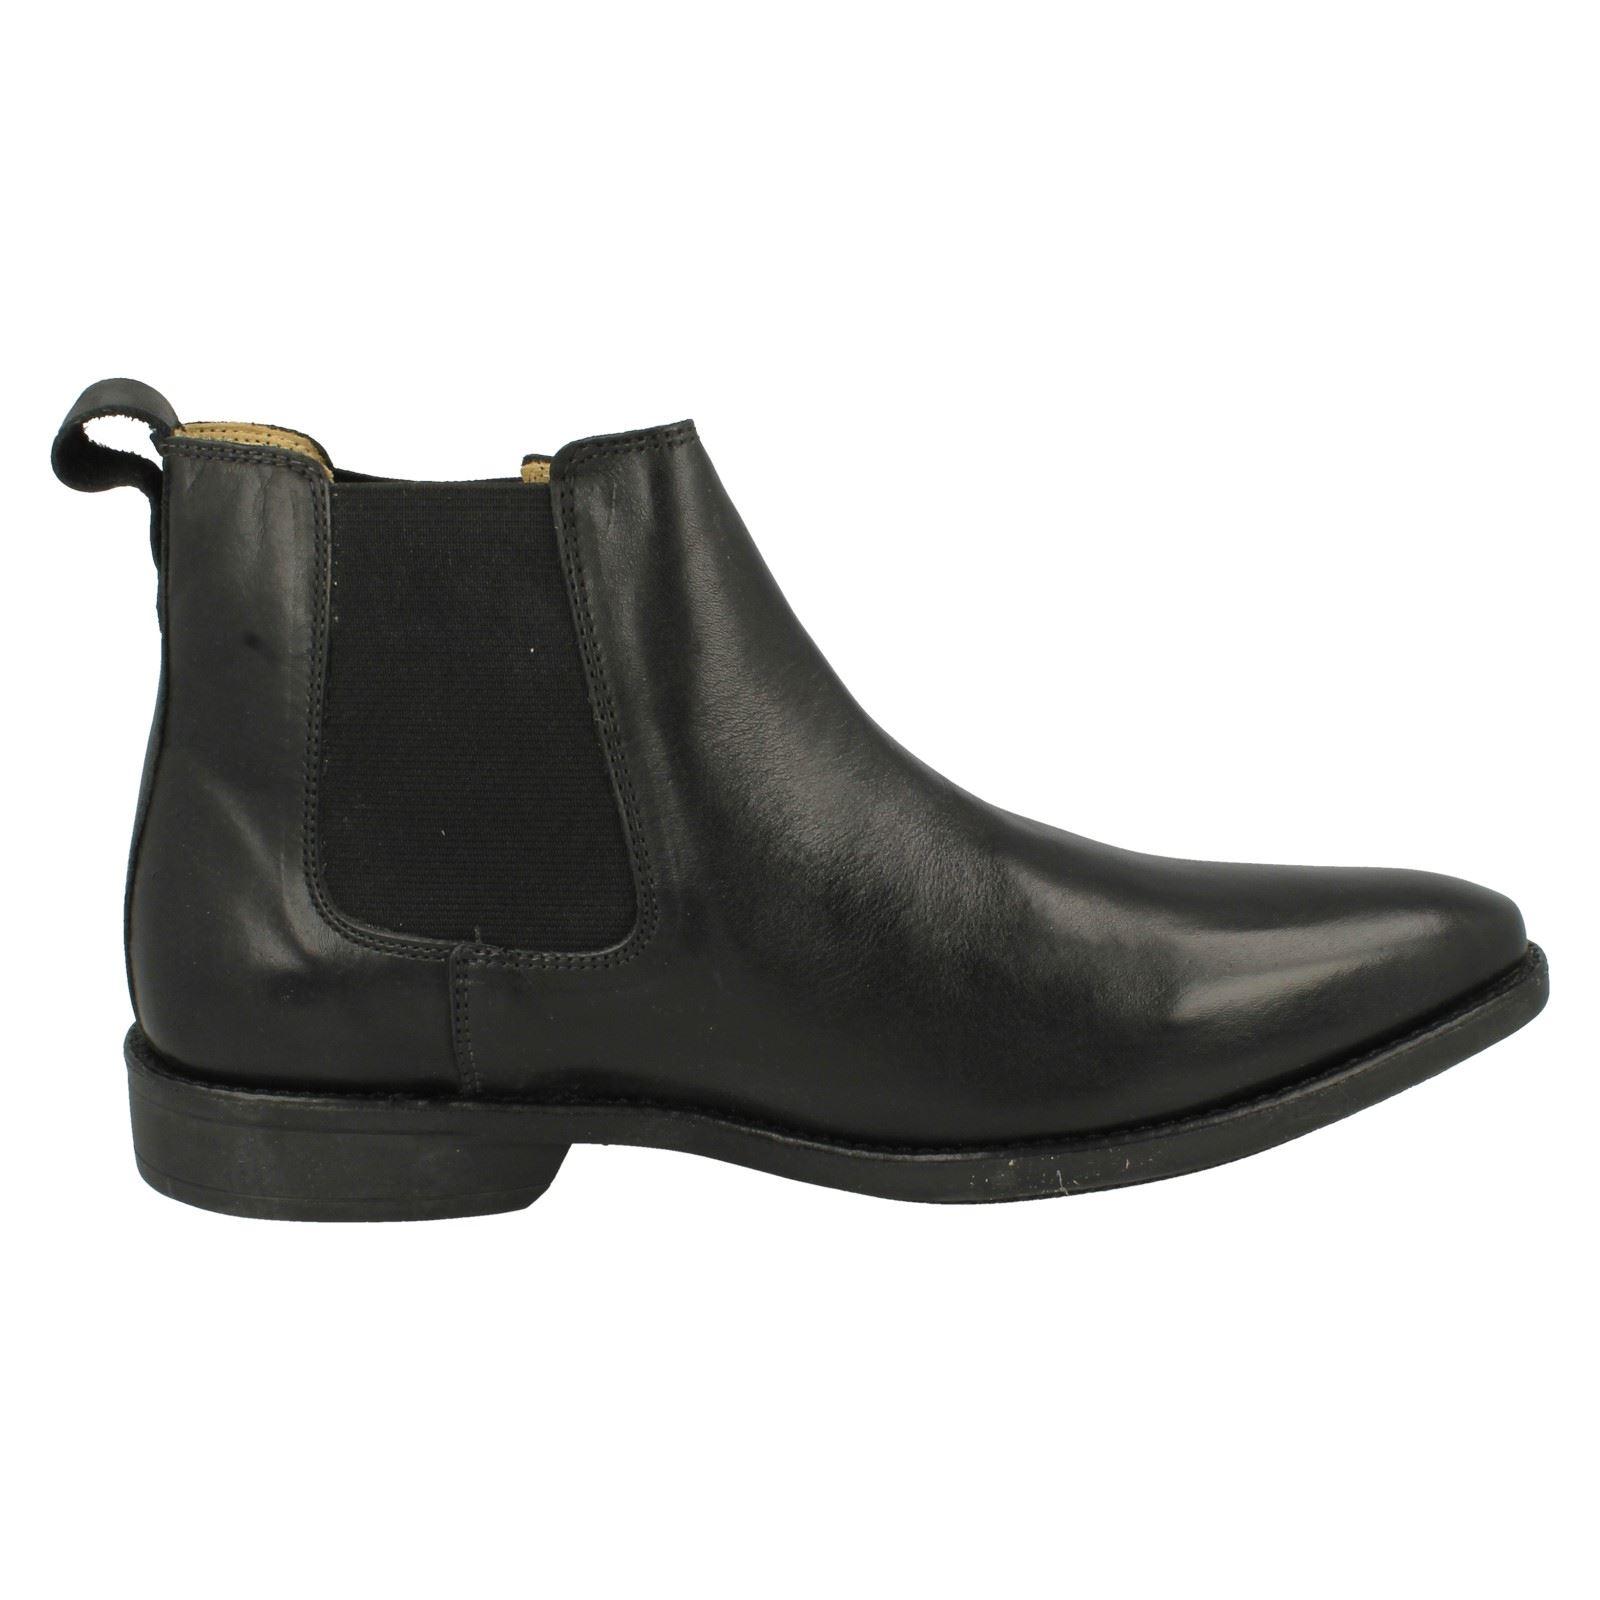 Mens-Anatomic-Chelsea-Boots-039-929211LB-039 thumbnail 9